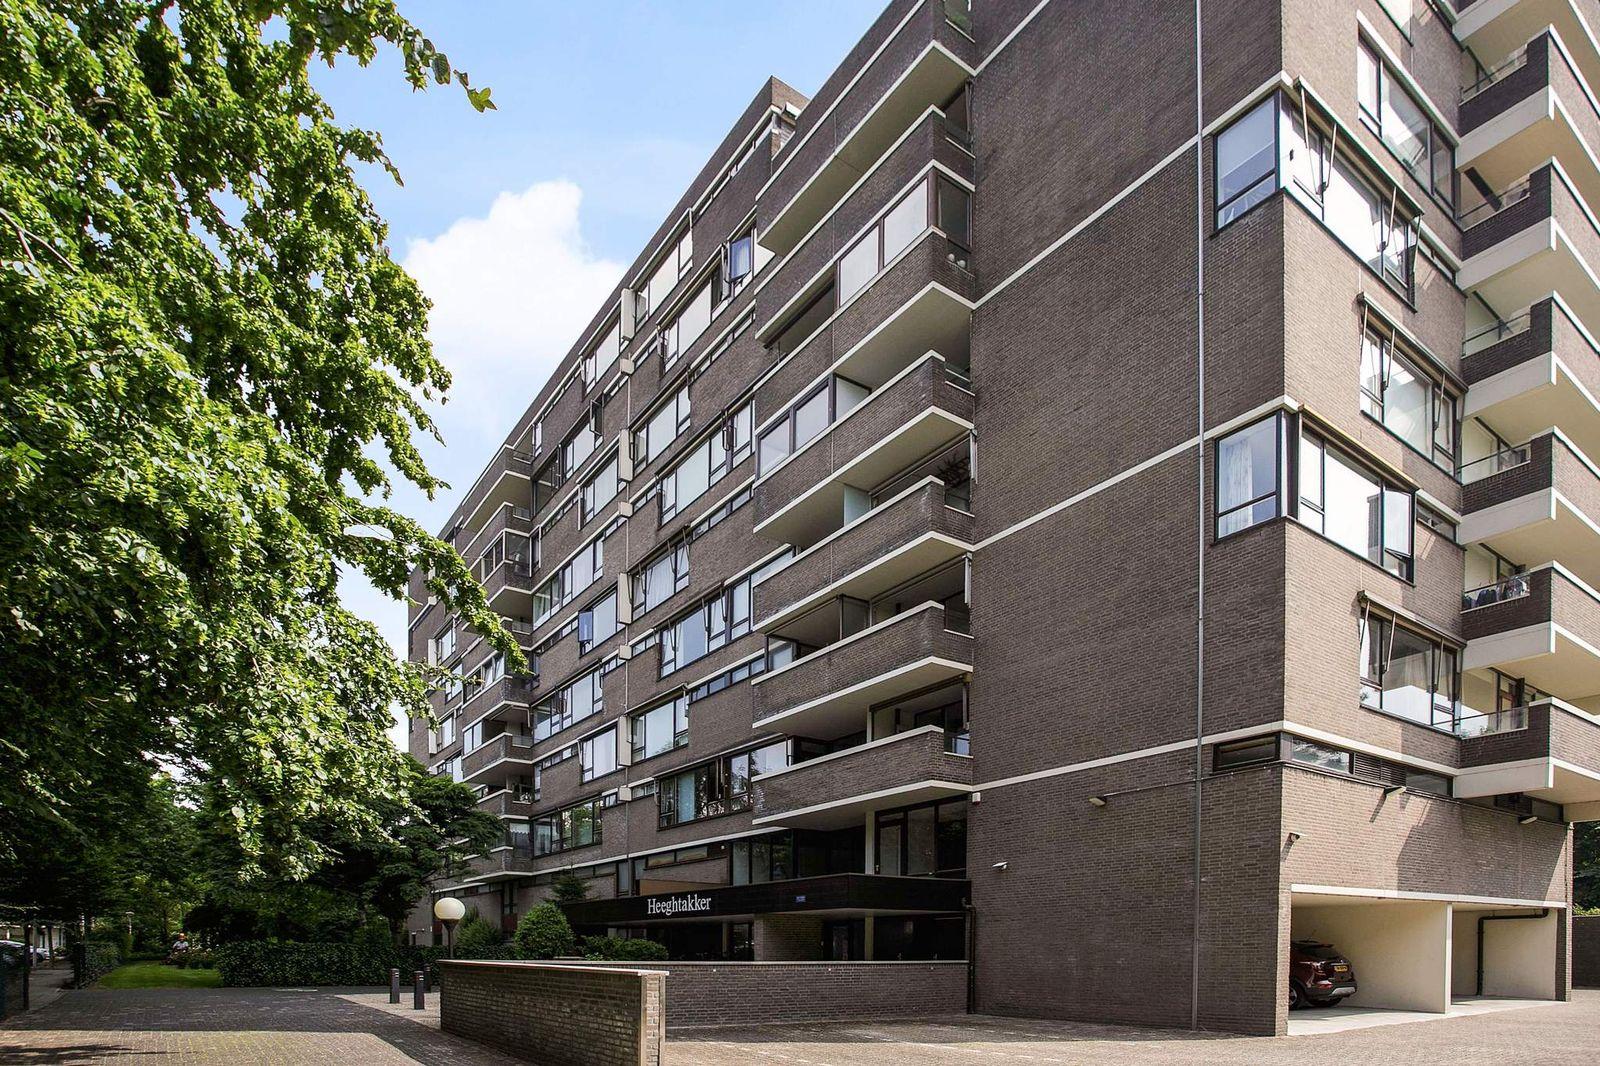 Heeghtakker 70, Eindhoven